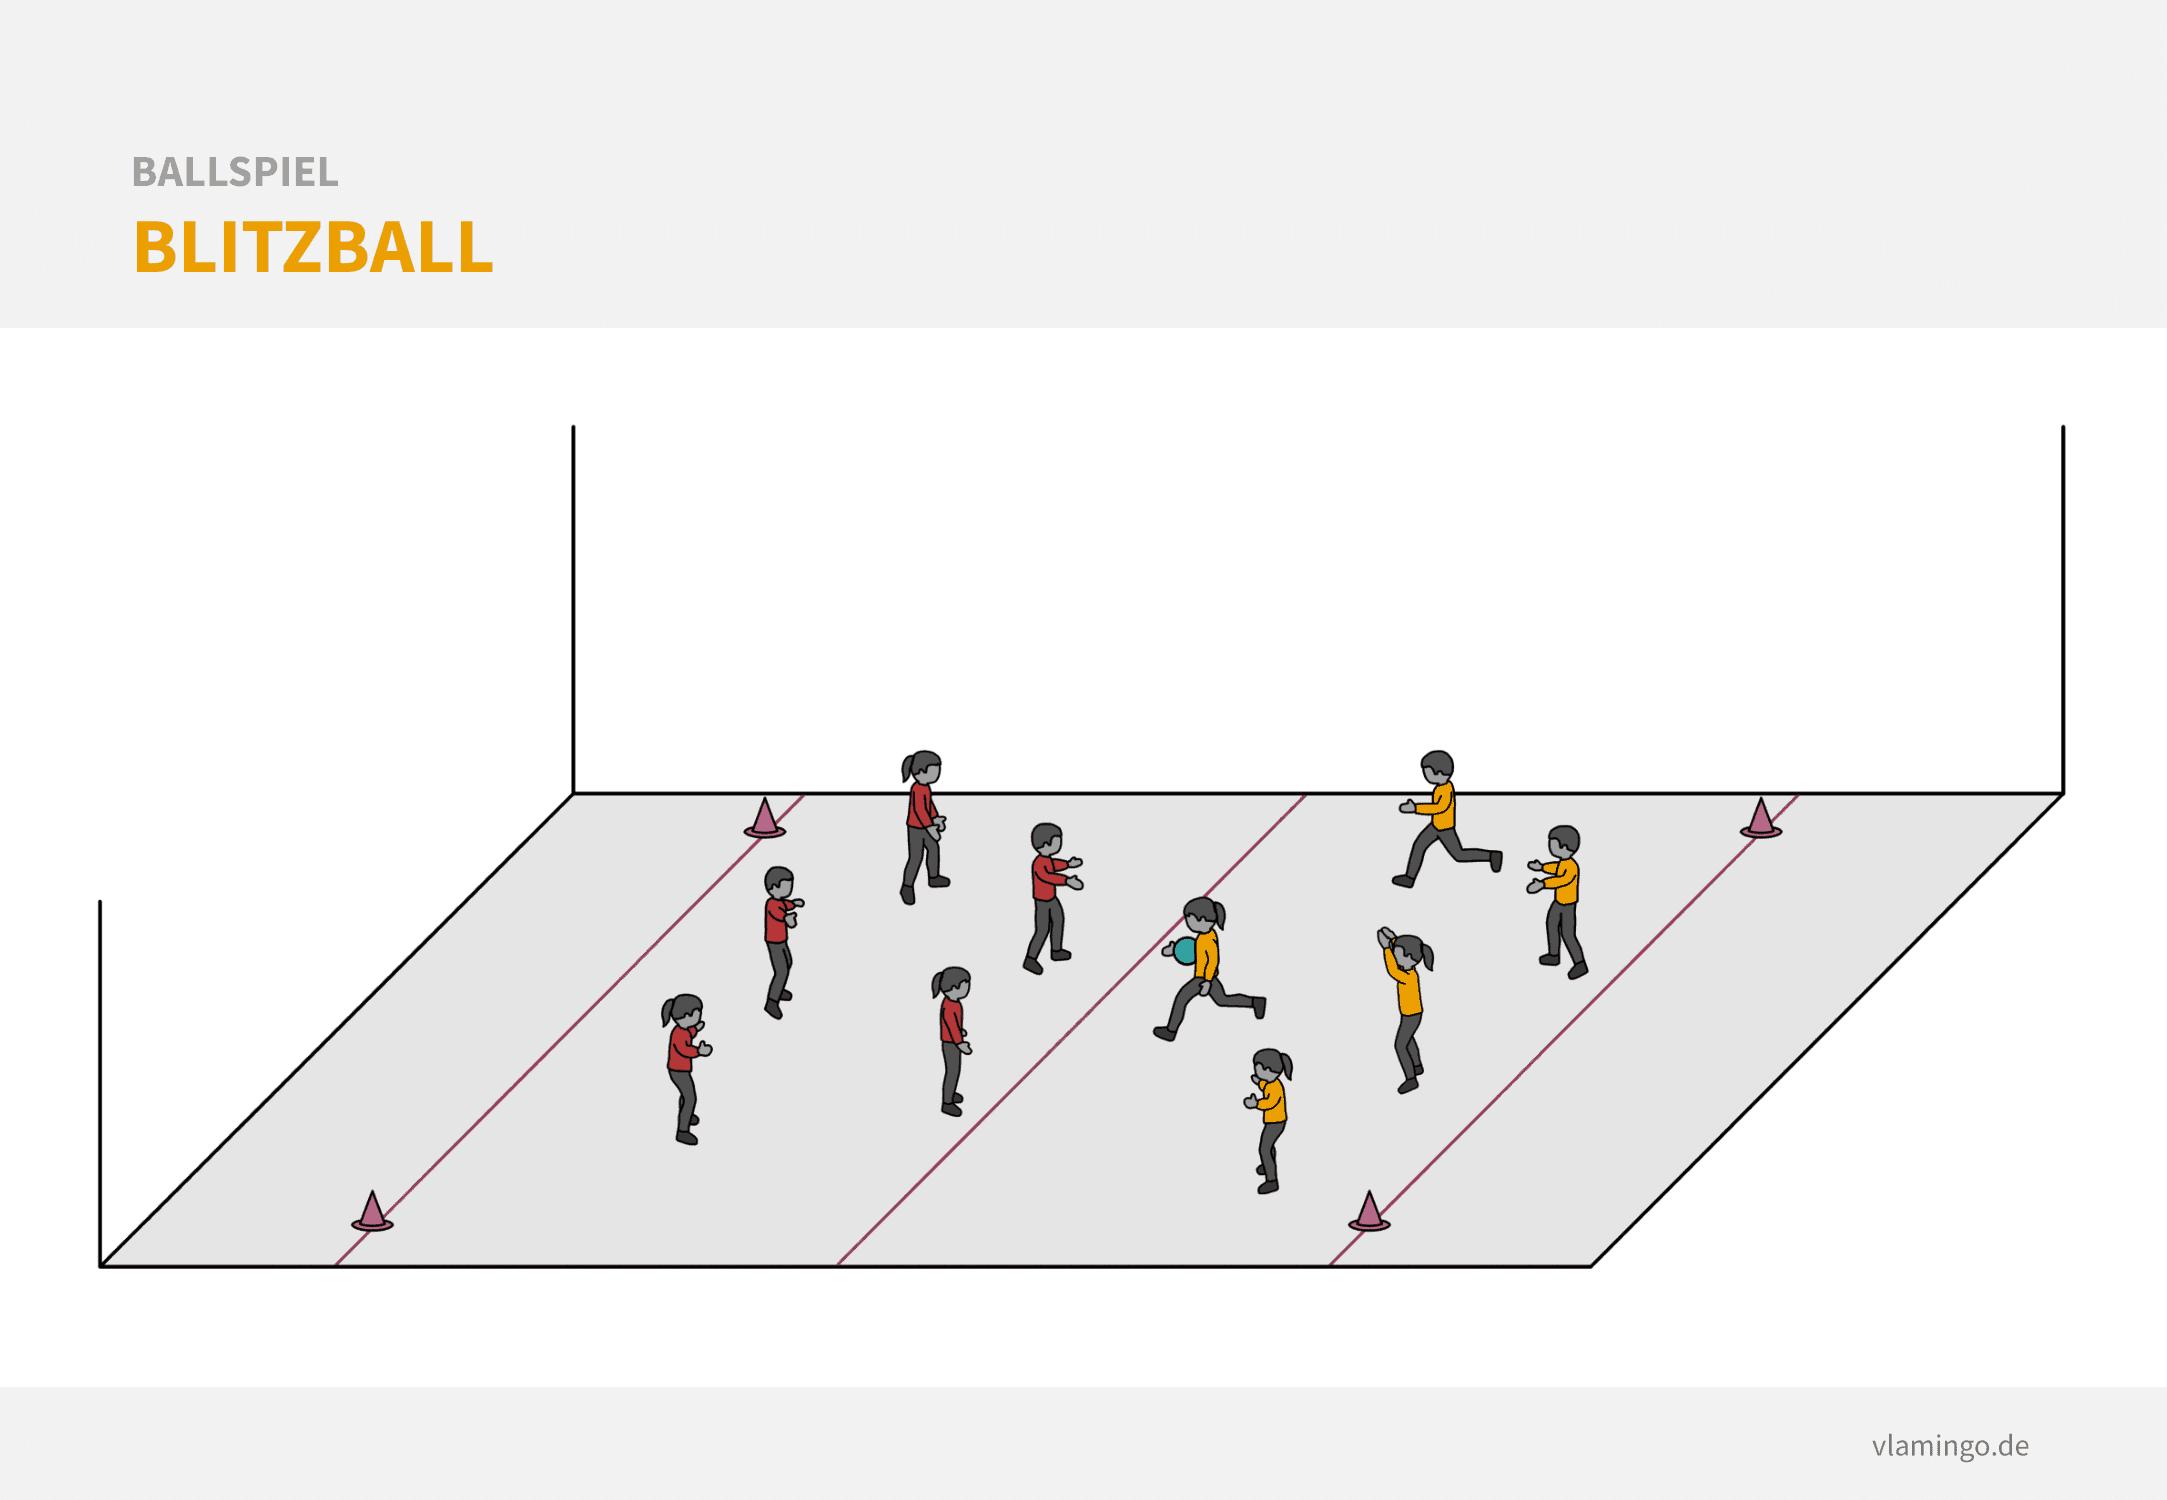 Ballspiel: Blitzball